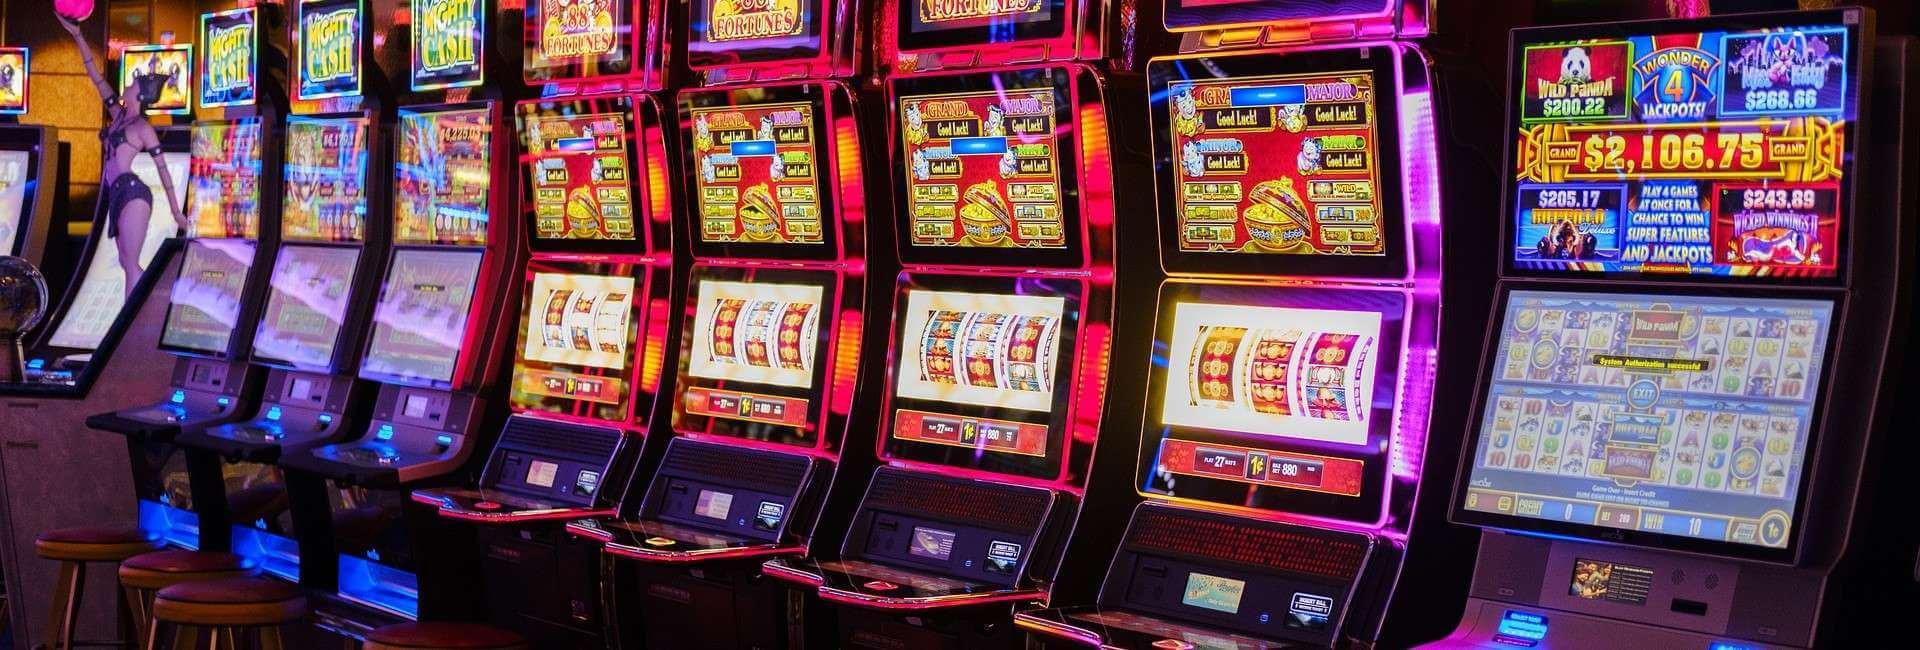 Casinospel top 10 casino Sverige Sugarboy